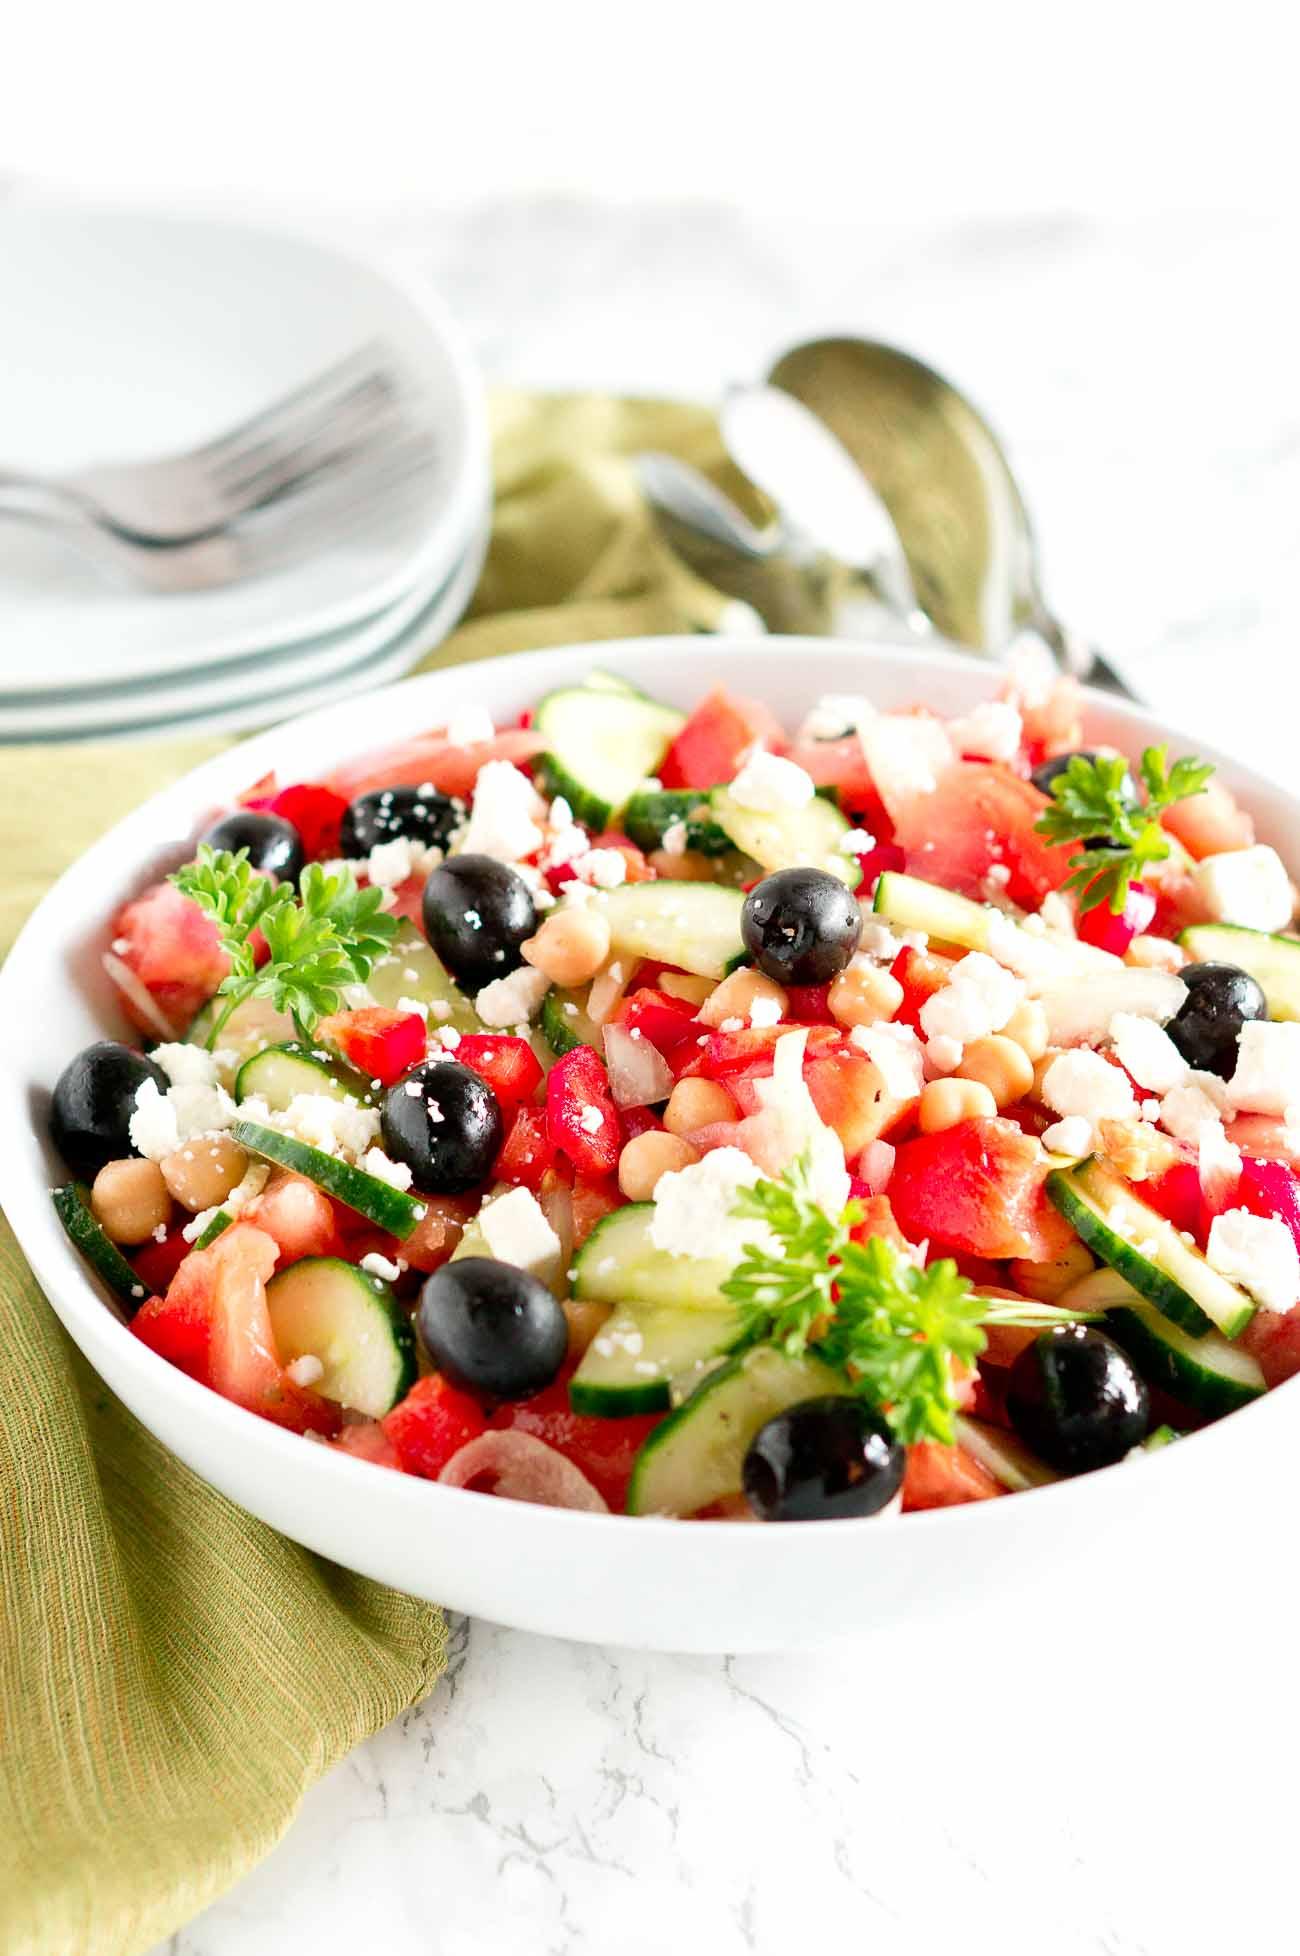 Greek Salad (aka Mediterranean salad) in a white bowl with green towel